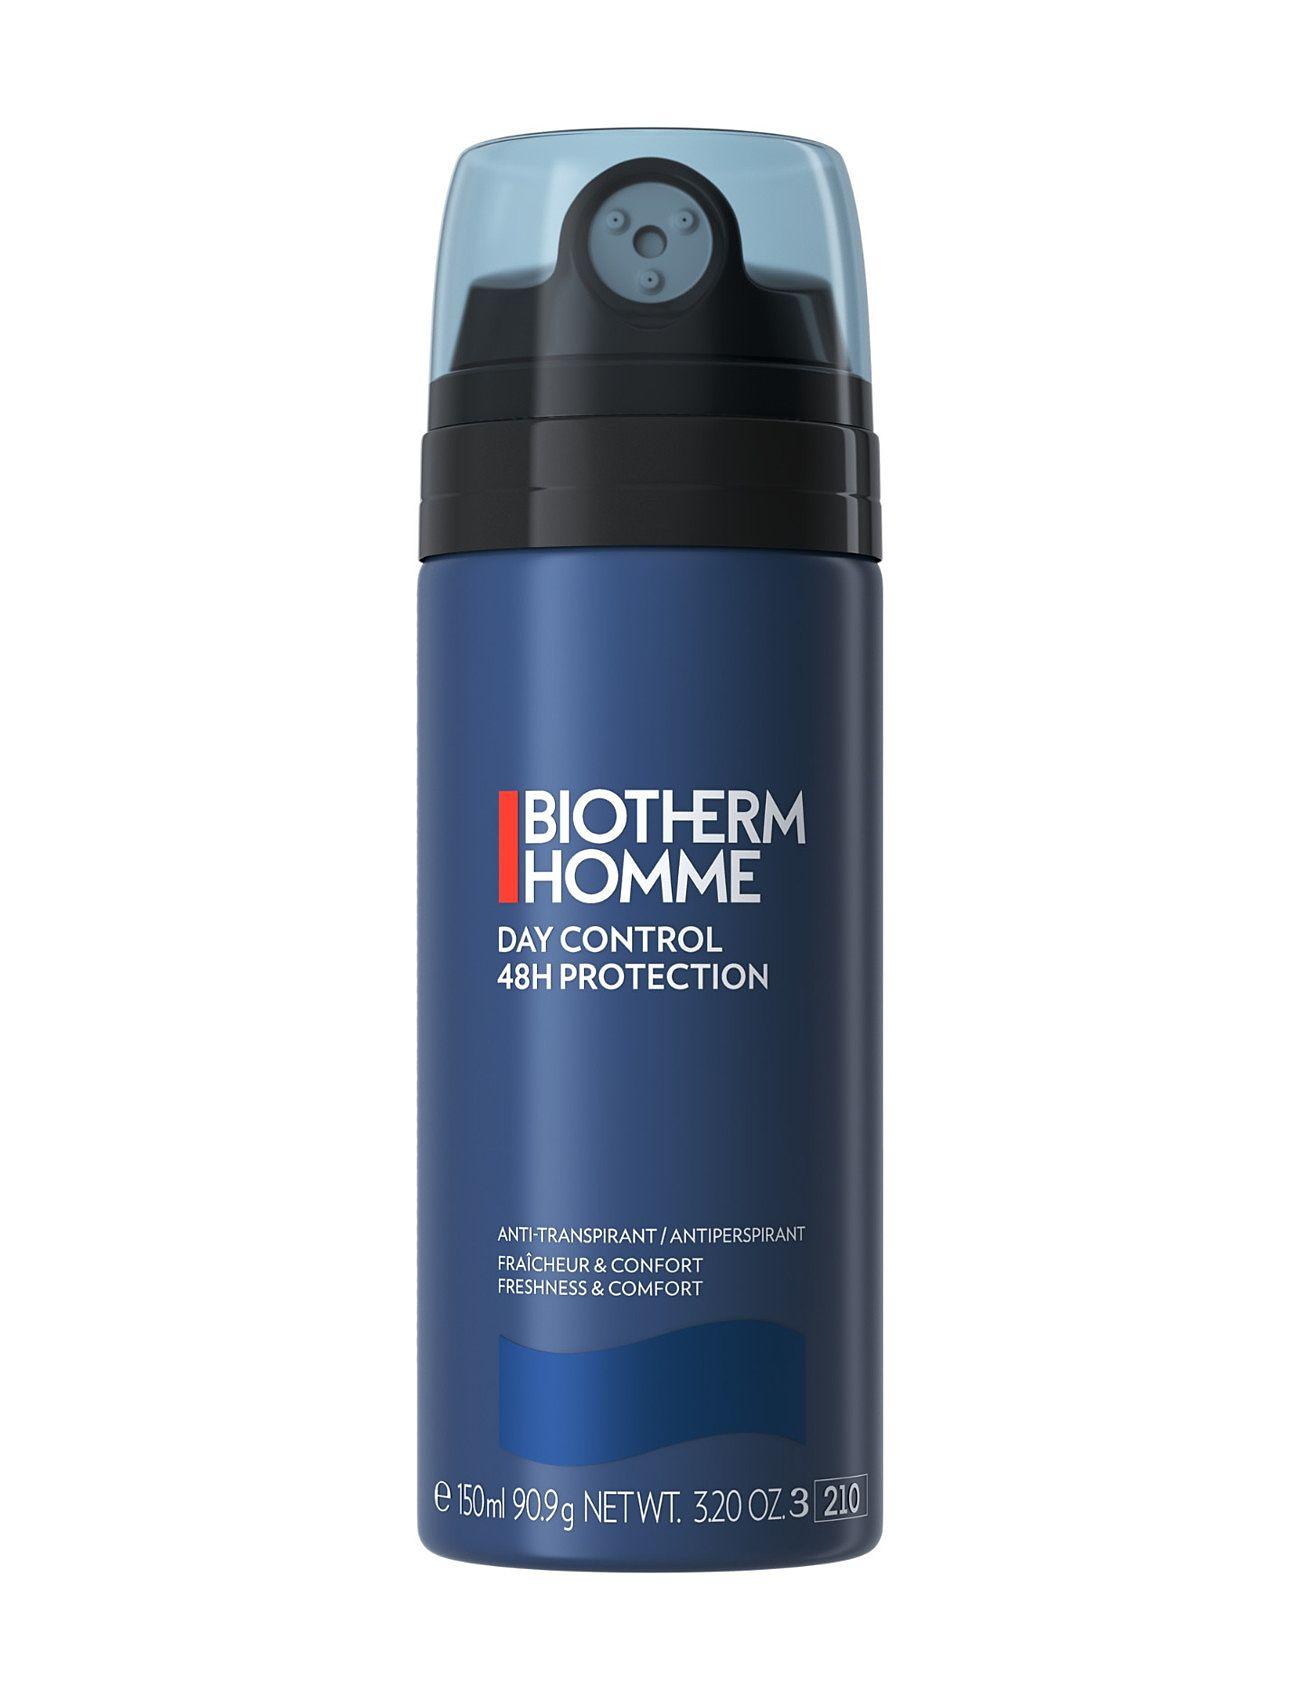 biotherm Day control deodorant spray 150 ml på boozt.com dk